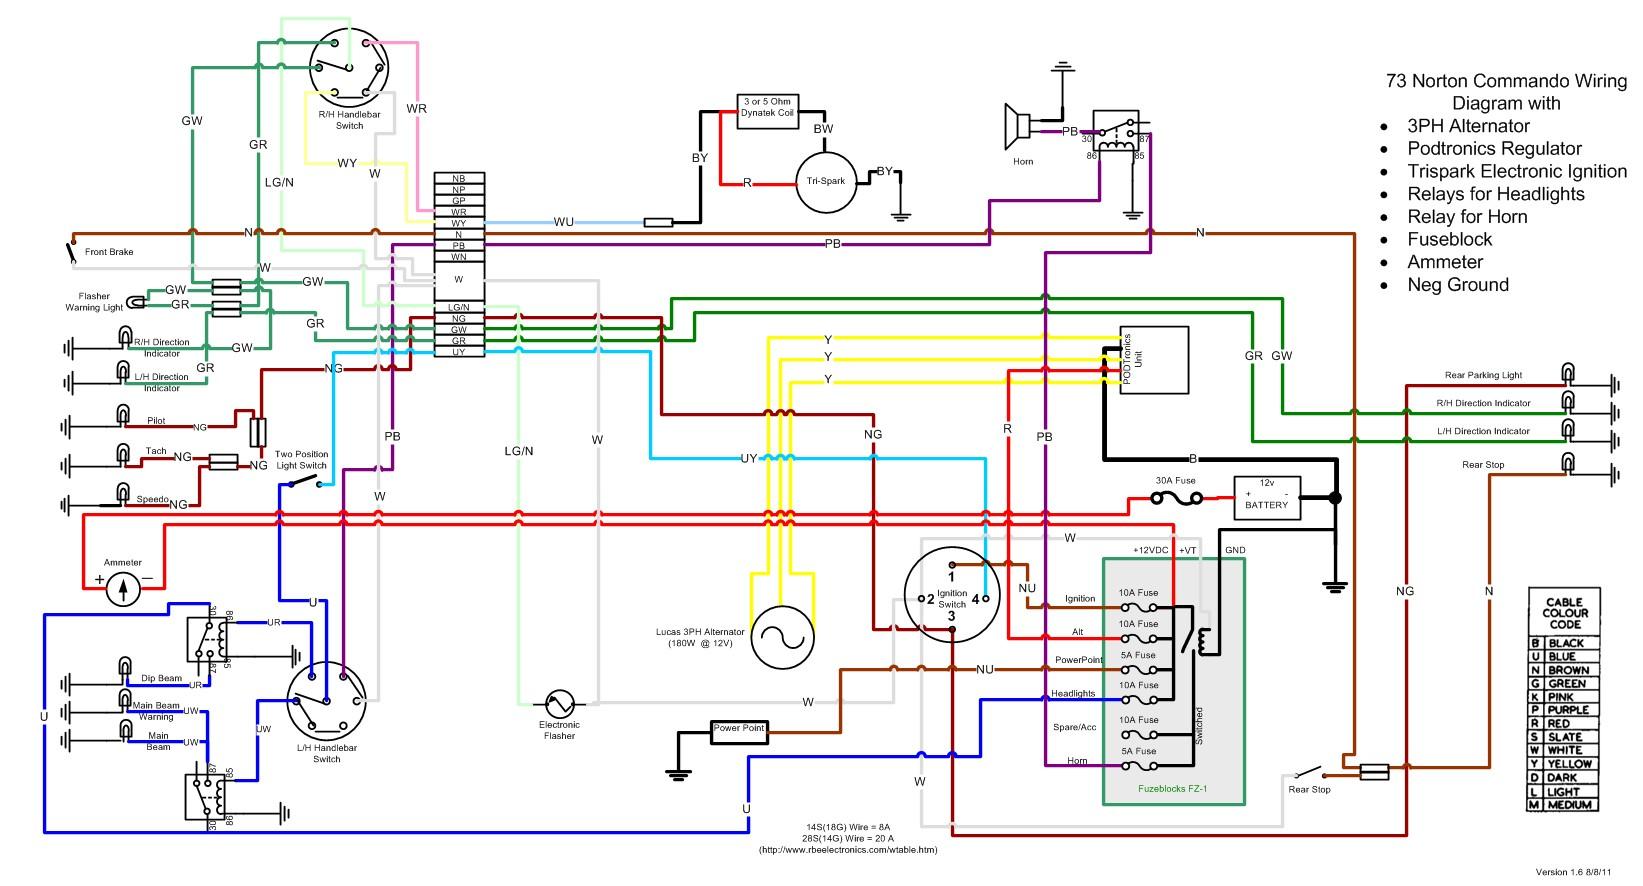 hight resolution of wiring diagram visio 2010 wiring diagram forward logic diagram in visio